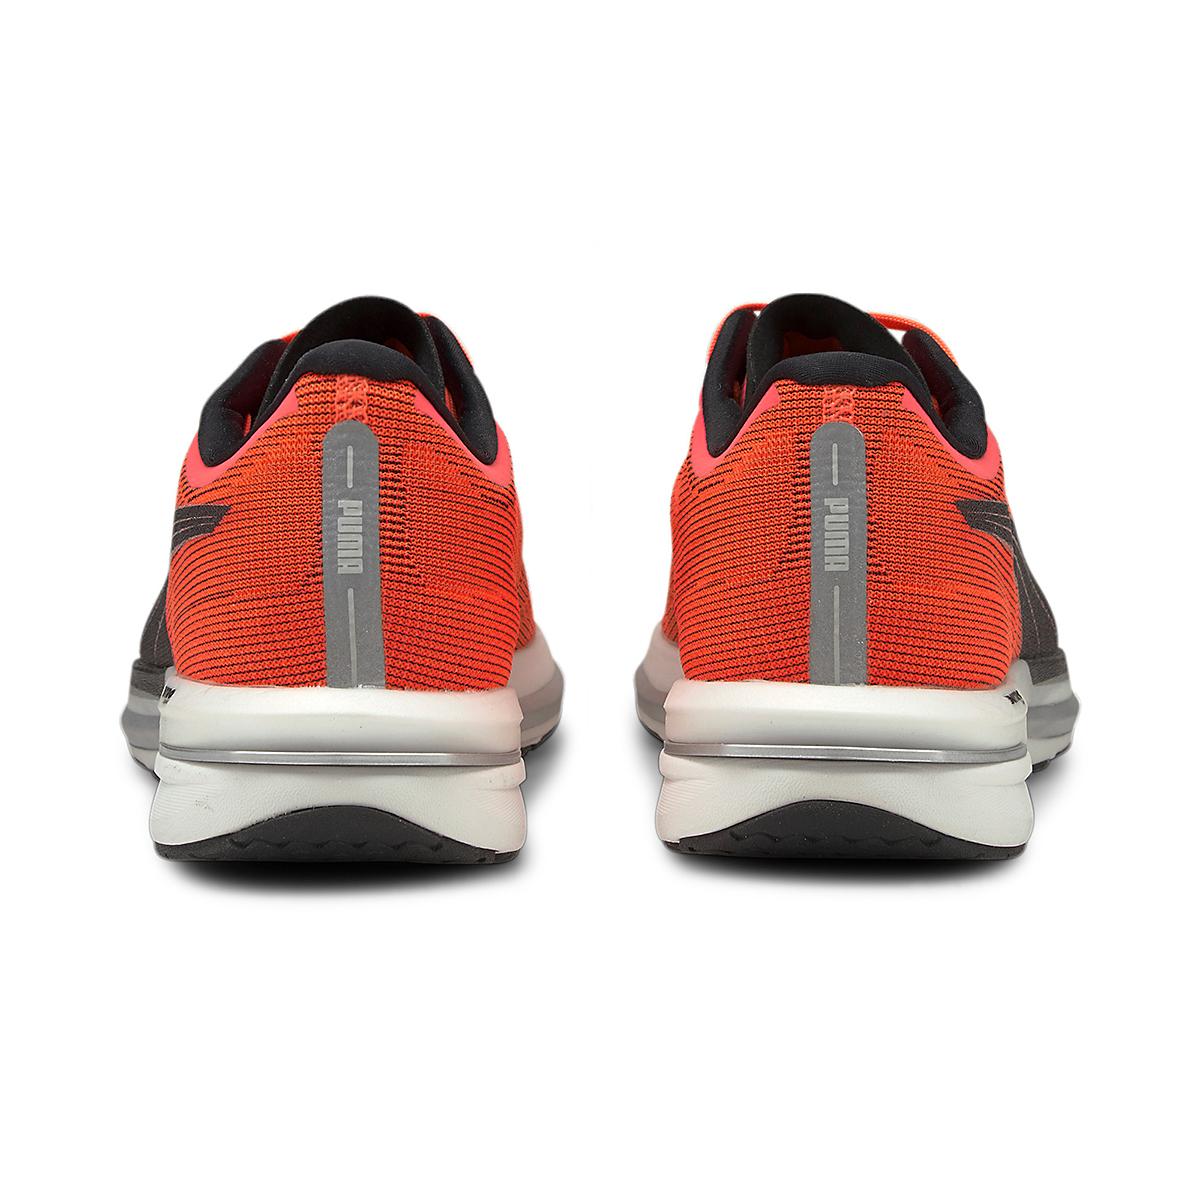 Women's Puma Velocity Nitro Running Shoe - Color: Lava Blast - Size: 5.5 - Width: Regular, Lava Blast, large, image 4